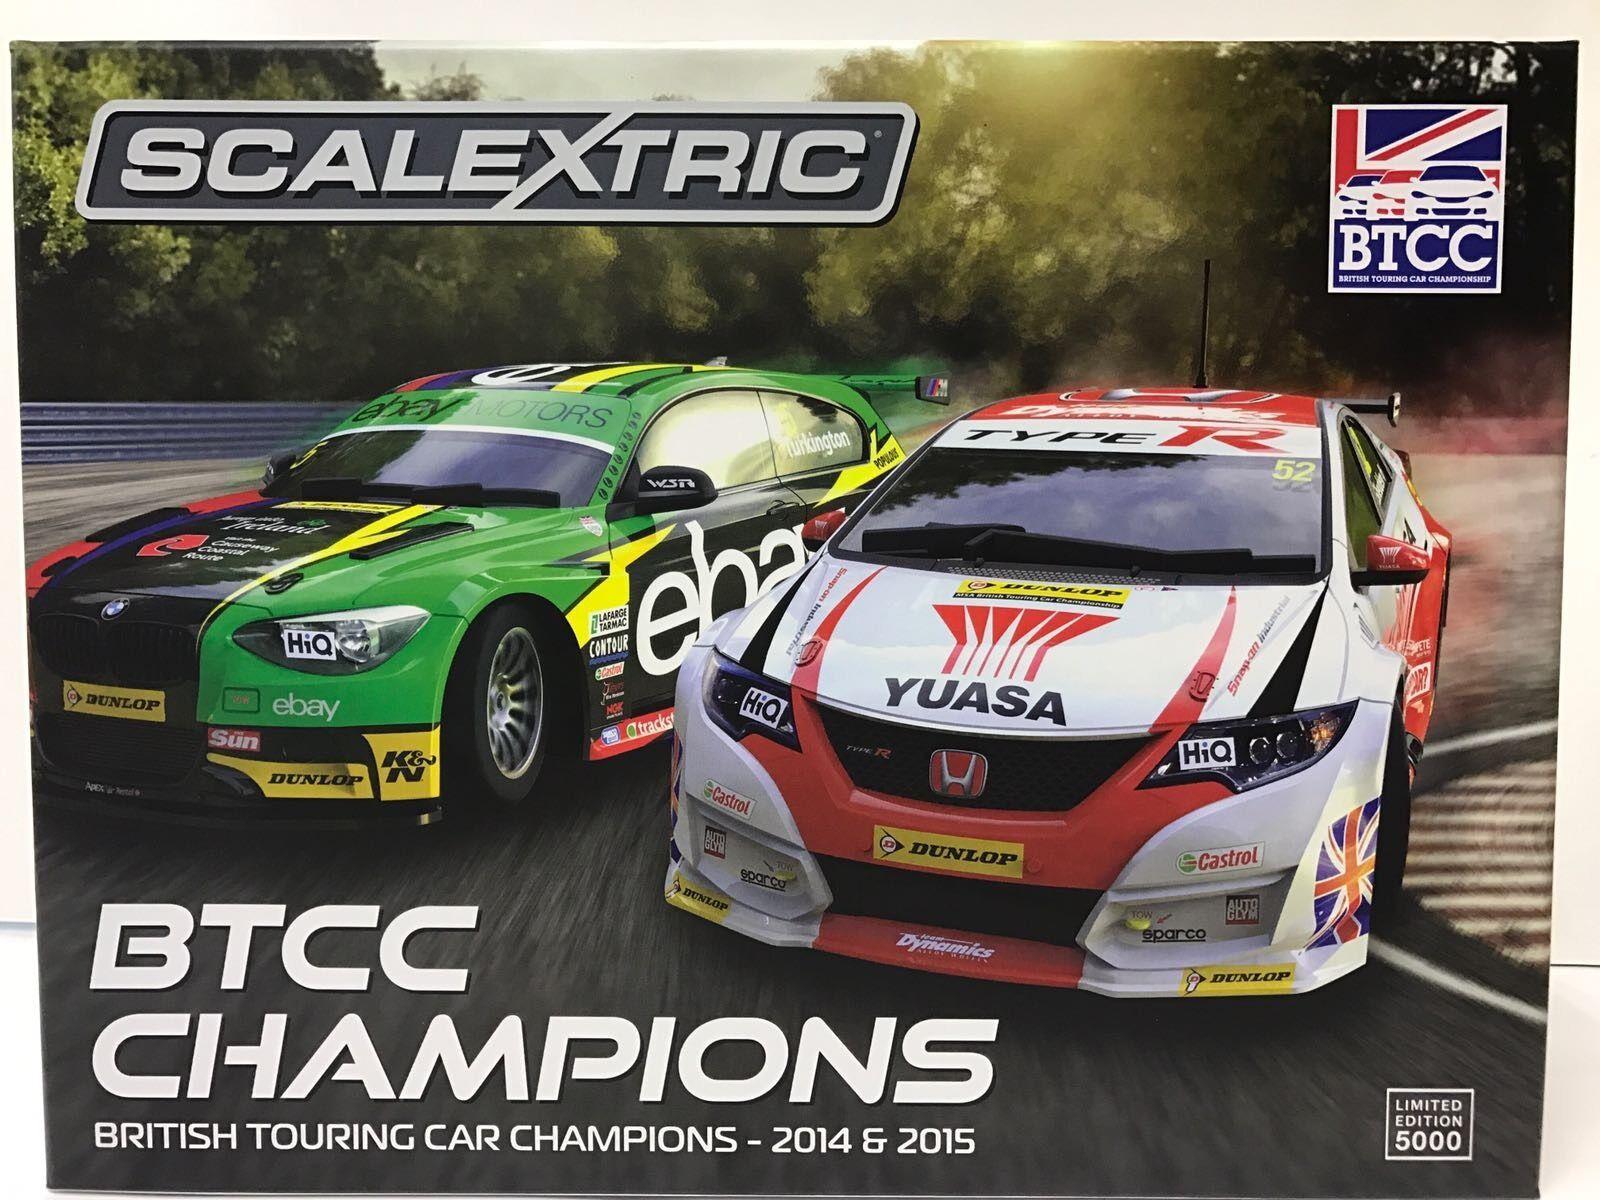 Scalextric C3694A, BTCC Campeones Twin Pack-BMW Pack-BMW Pack-BMW 125 Series 1 & Honda Civic a0b53a